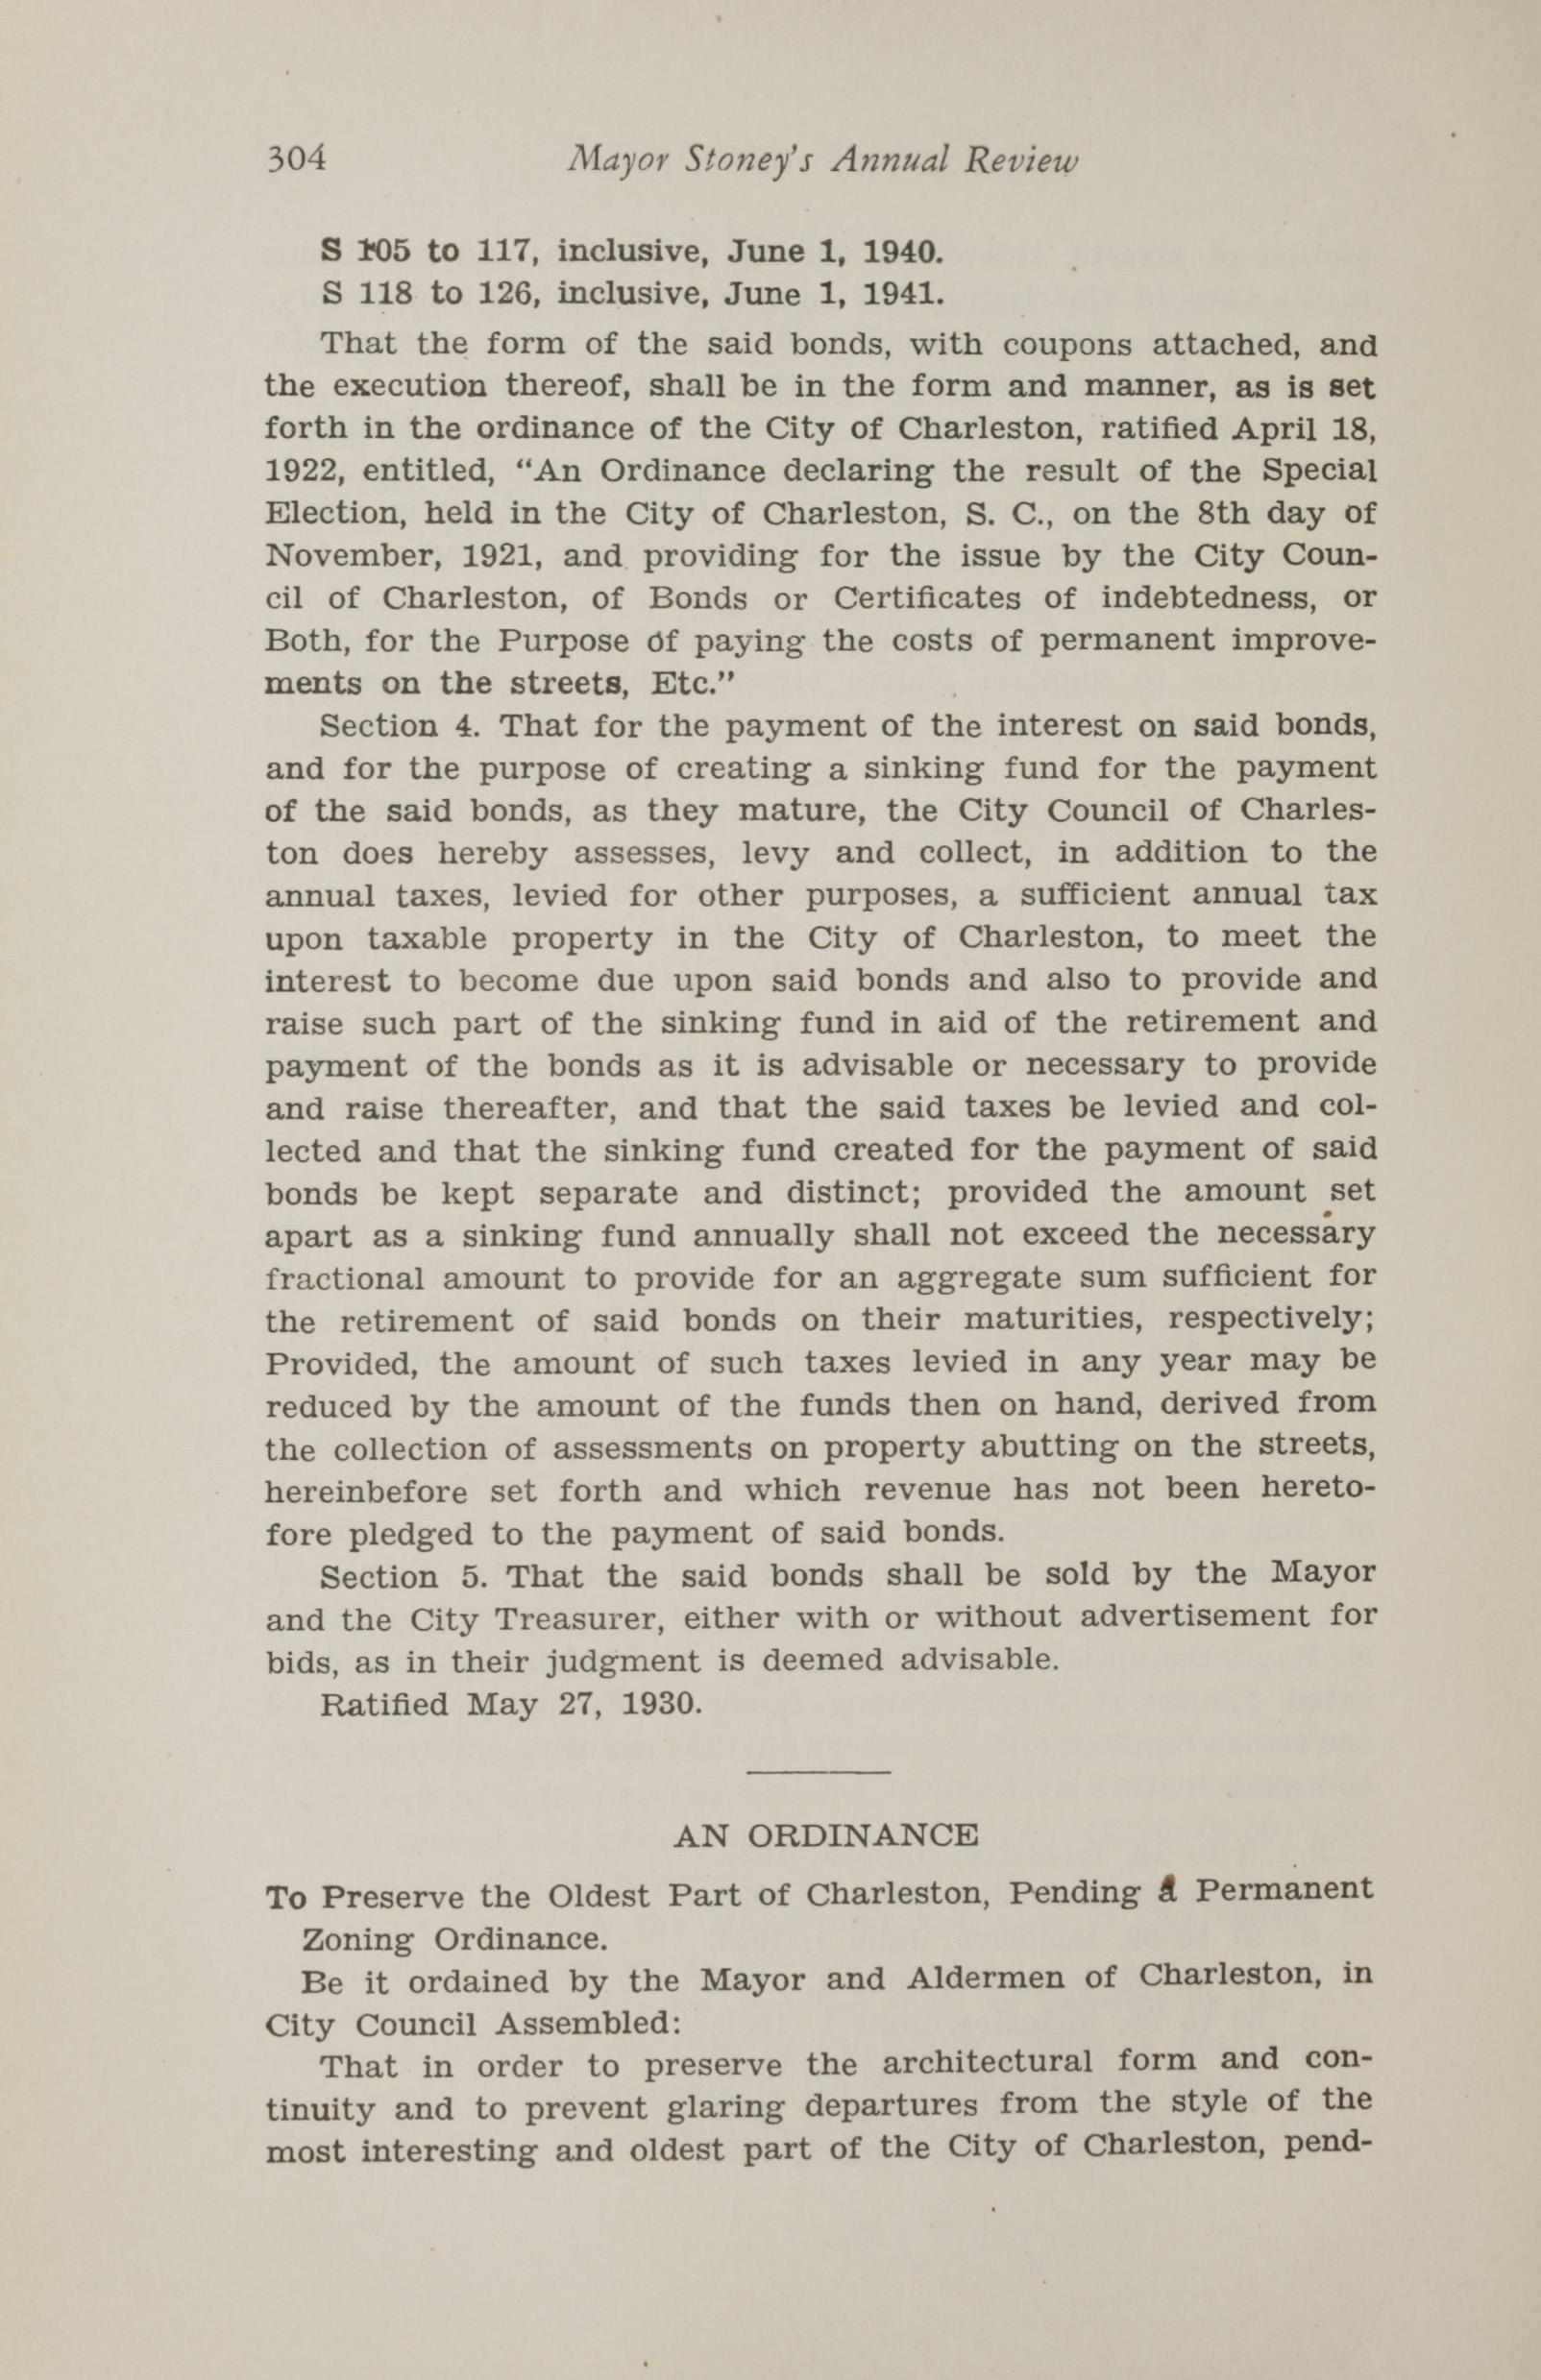 Charleston Yearbook, 1930, page 304